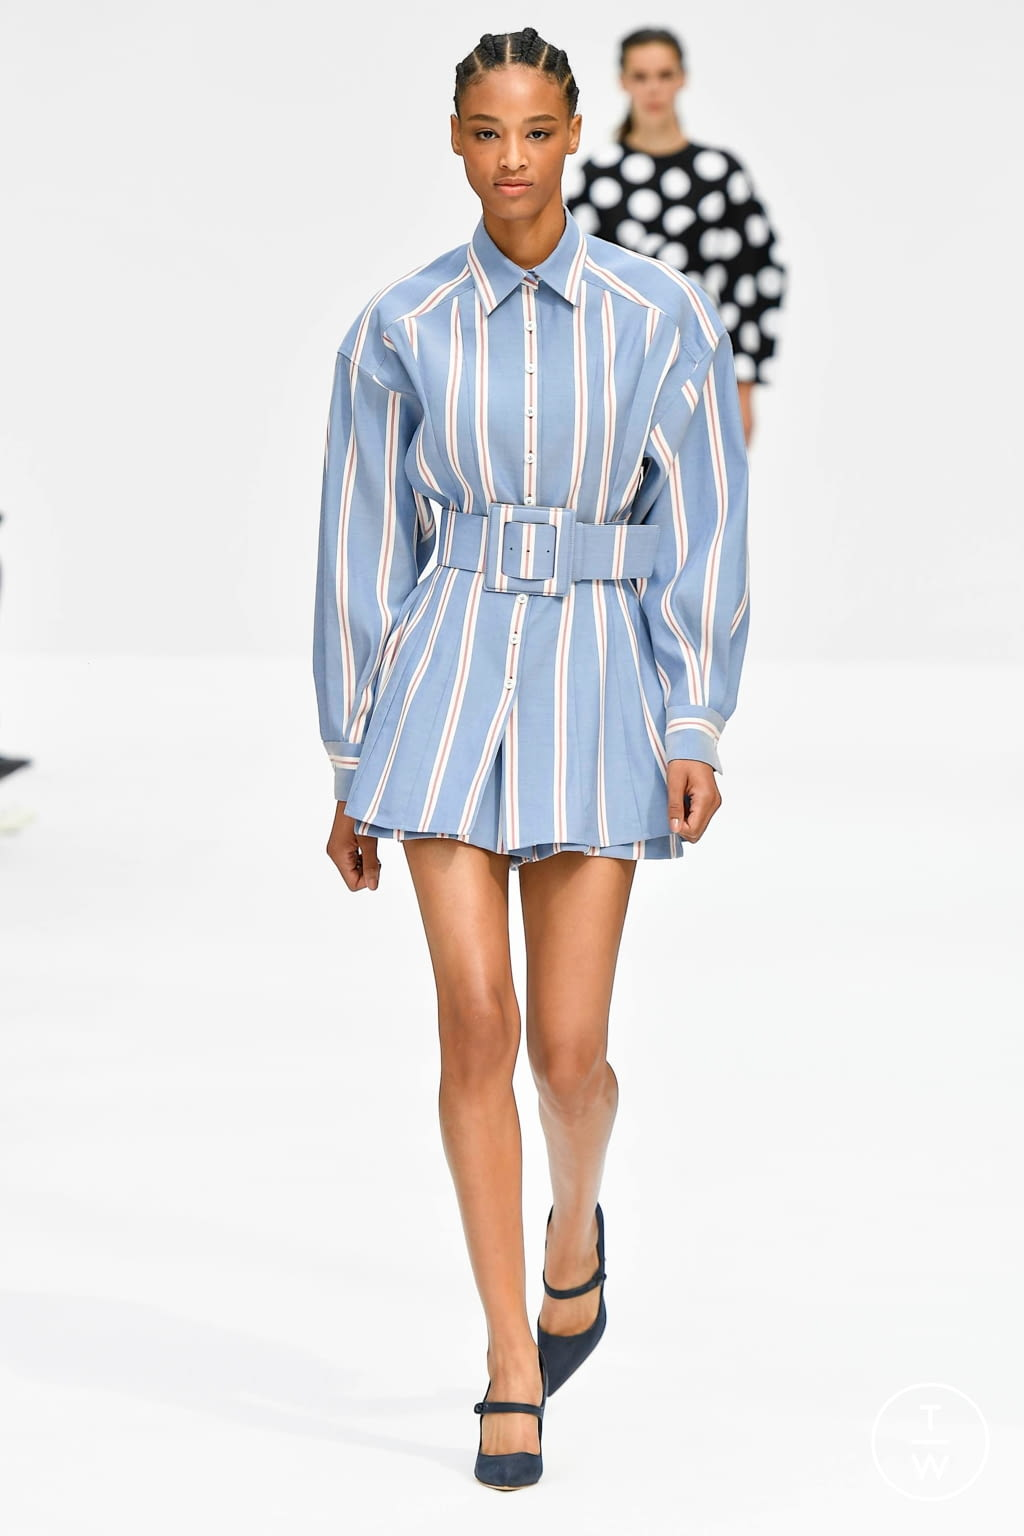 Fashion Week New York Spring/Summer 2020 look 19 de la collection Carolina Herrera womenswear